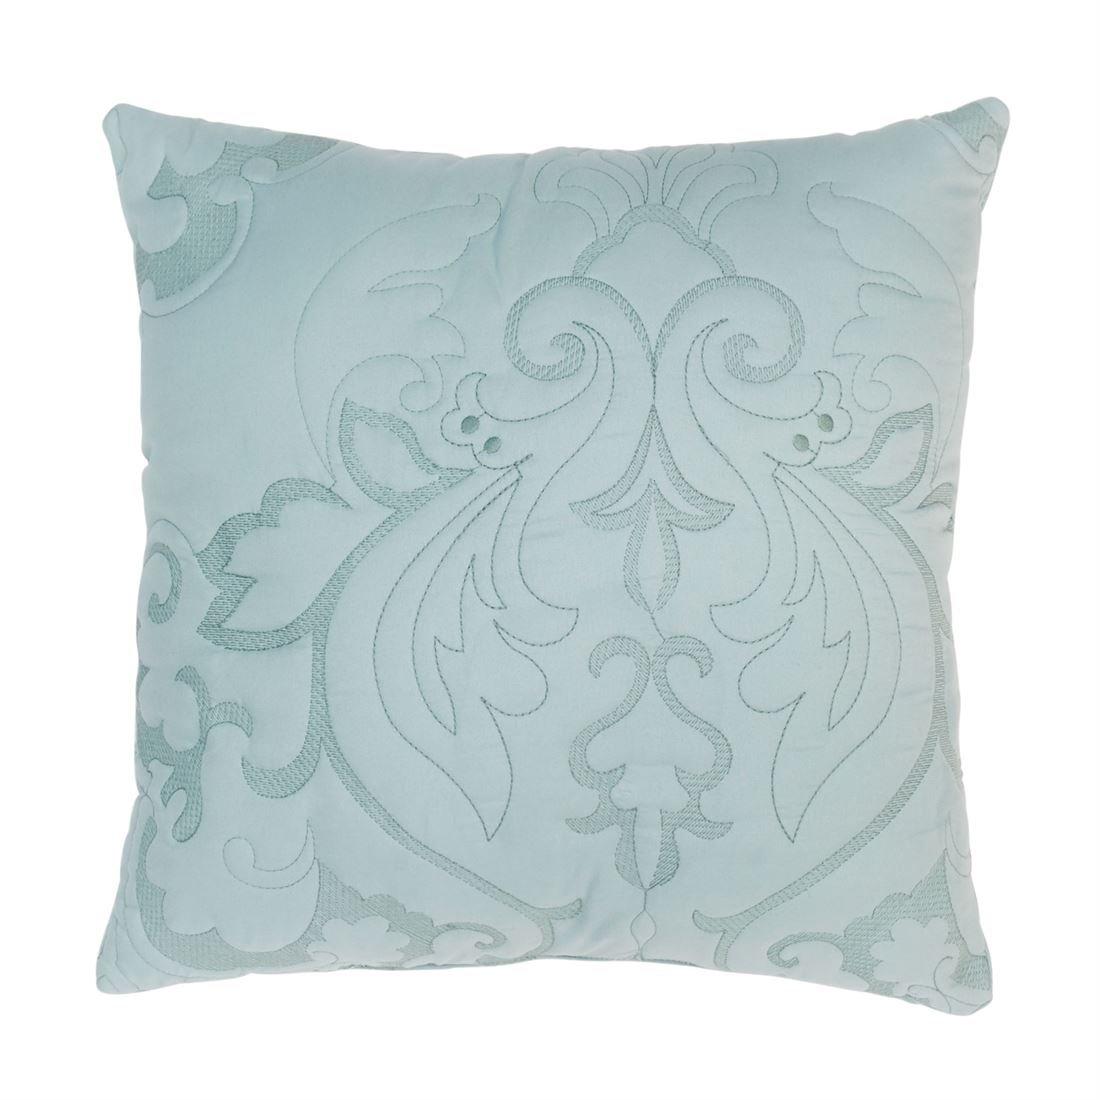 BrylaneHome Amelia 16'' Square Pillow (Seaglass,0)